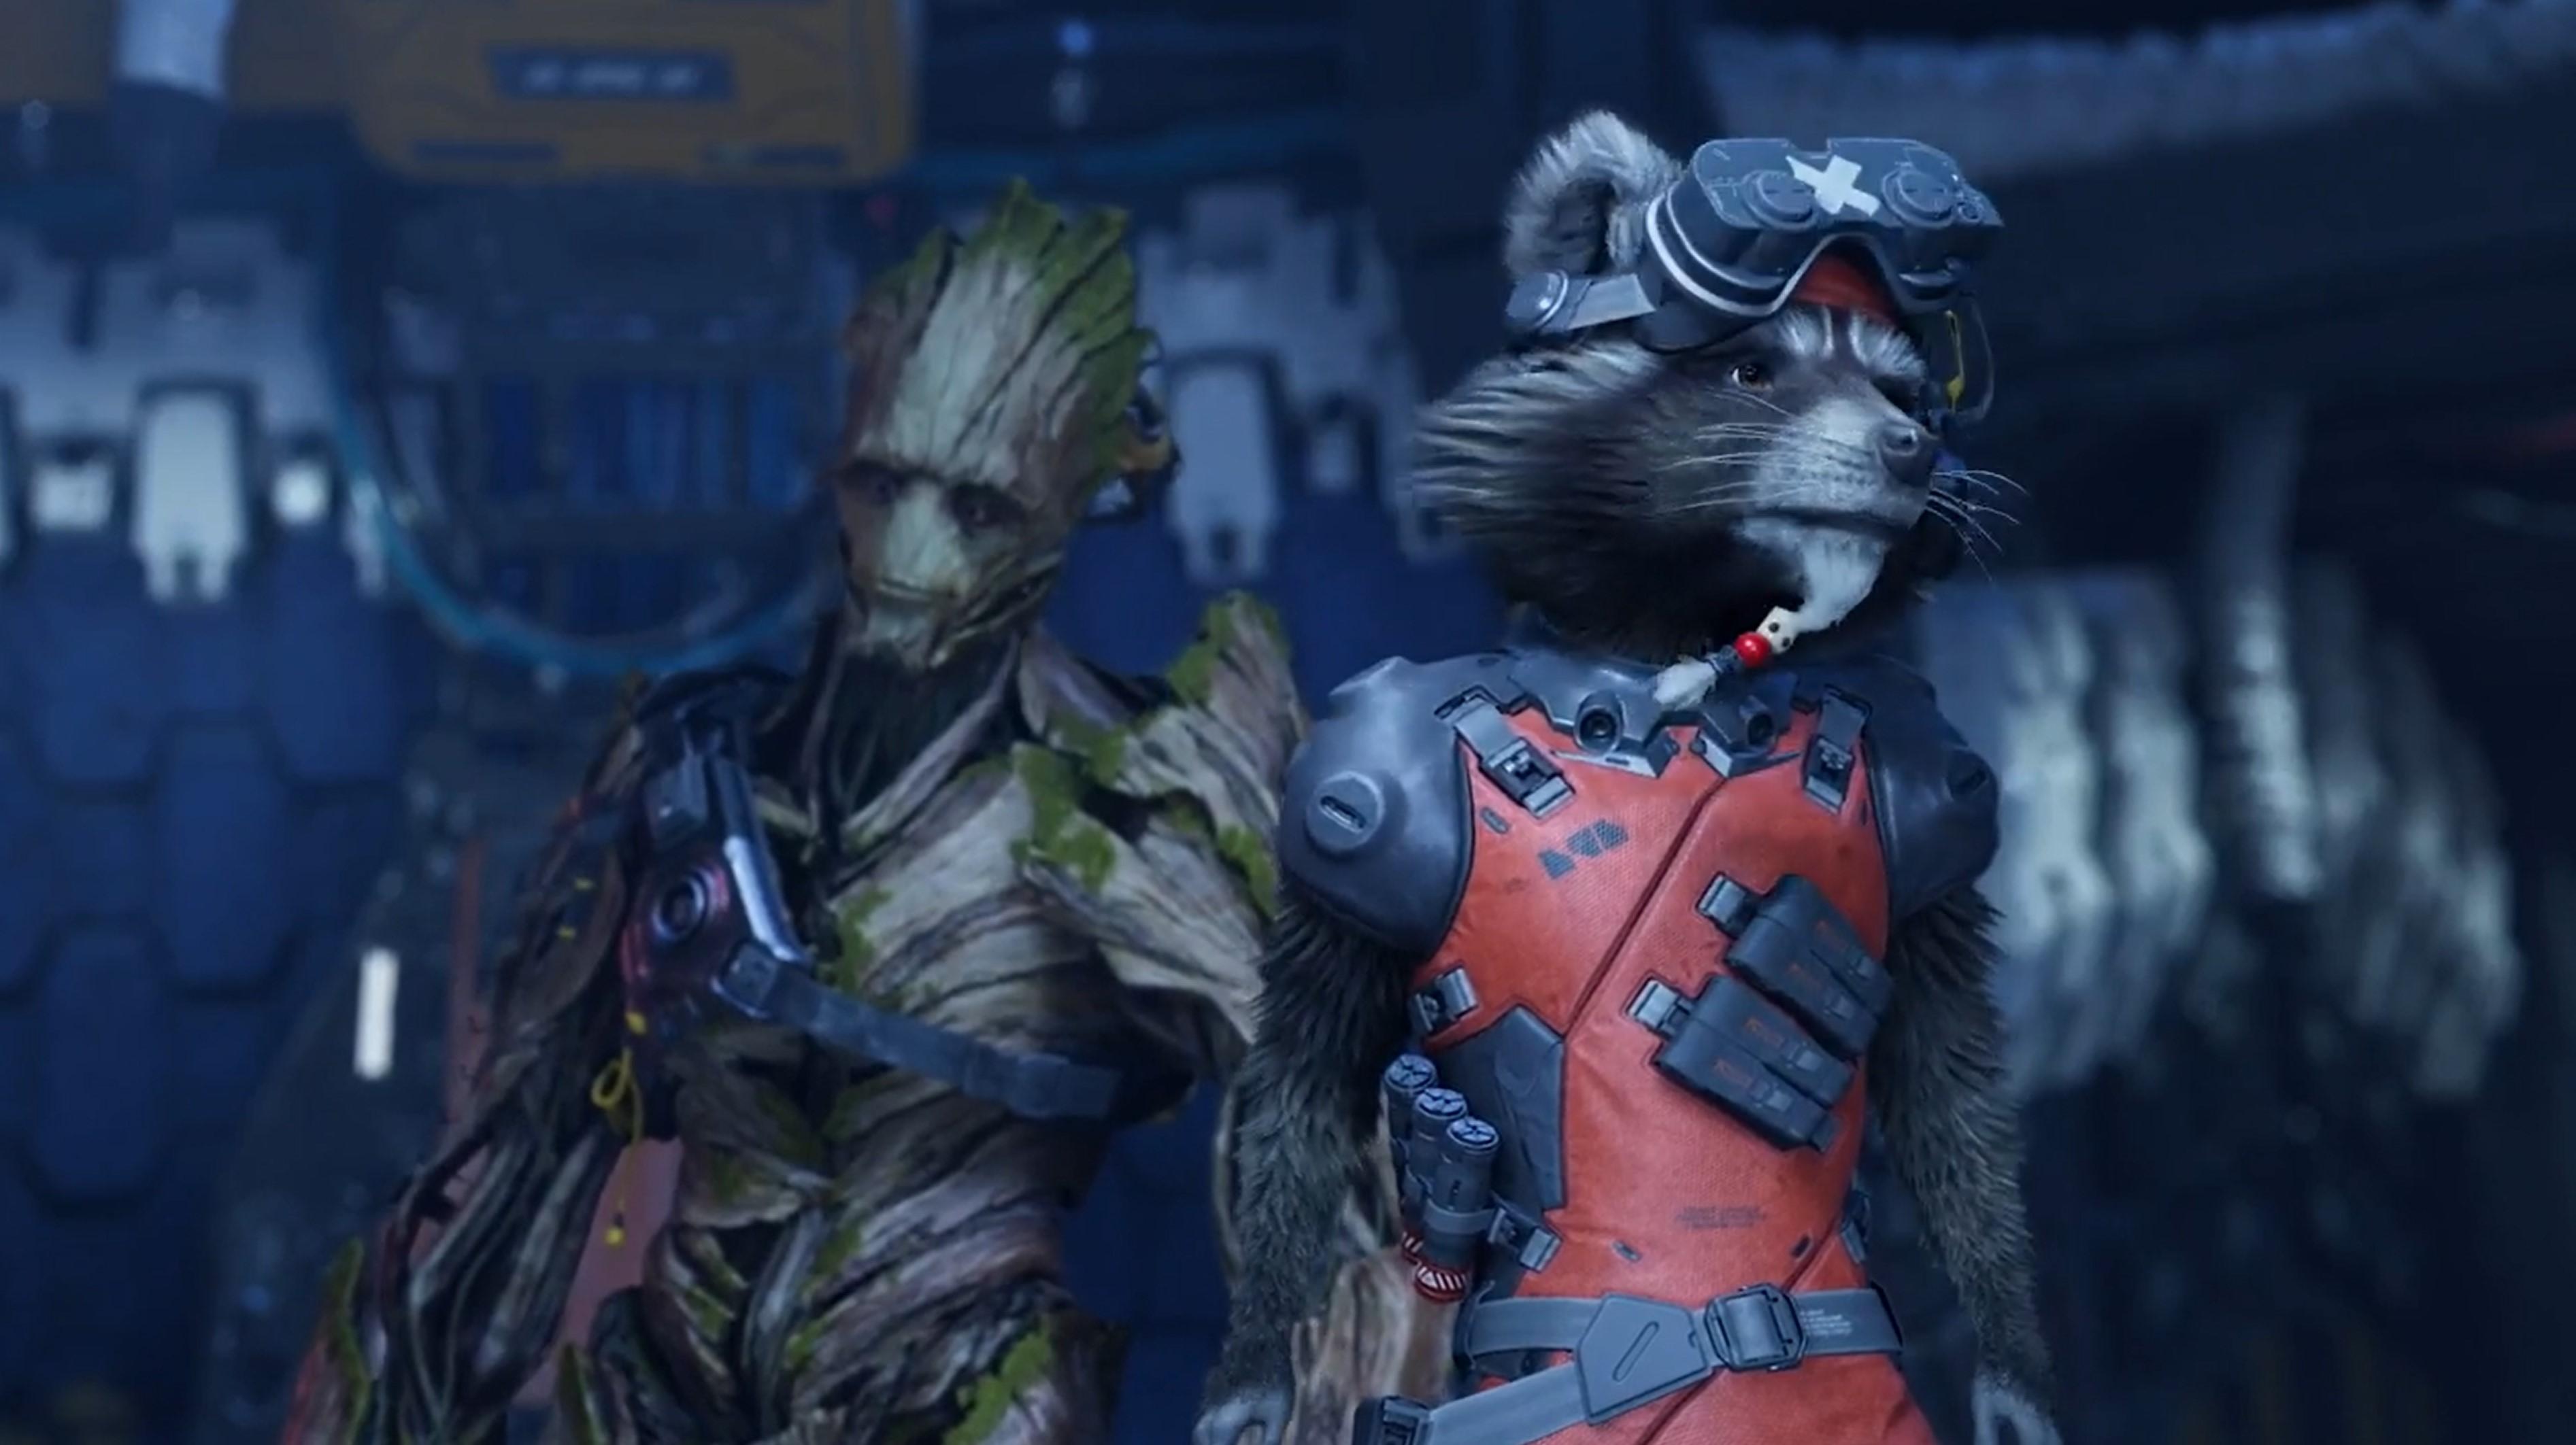 Square Enix E3 Guardians of the Galaxy